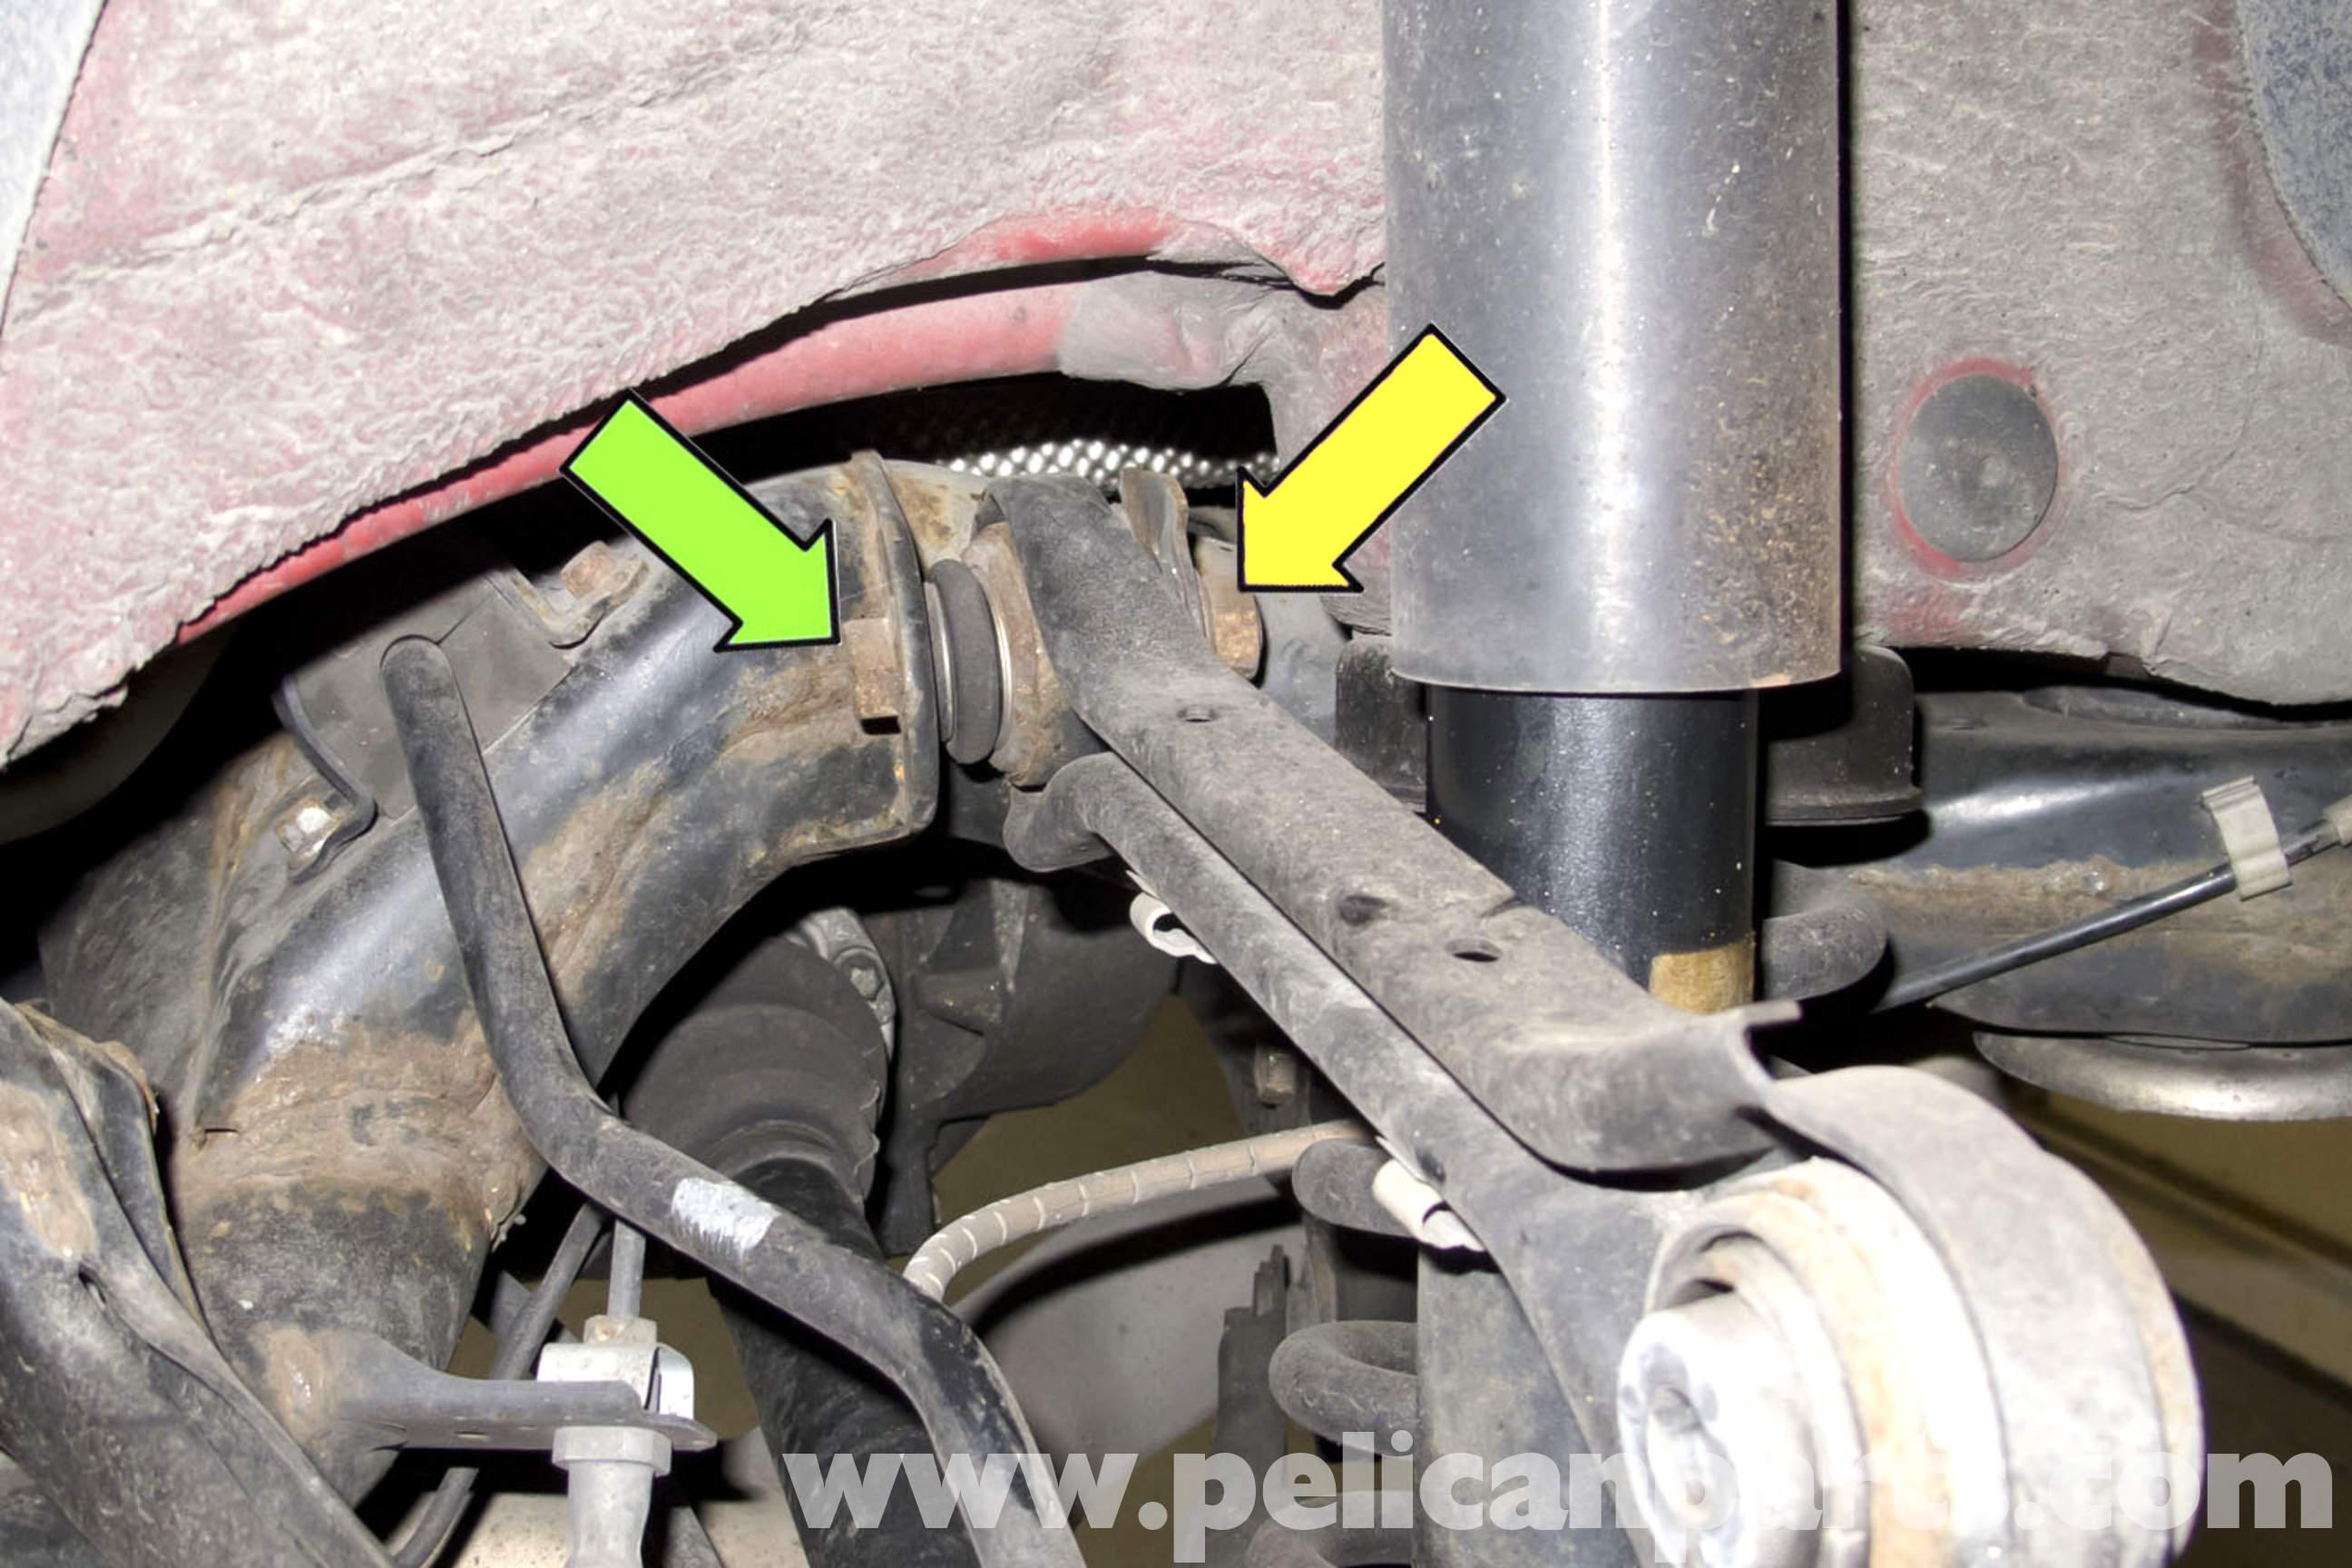 bmw e90 rear upper control arm replacement e91  e92  e93 pelican parts diy maintenance article 1969 BMW R50 1969 BMW R50